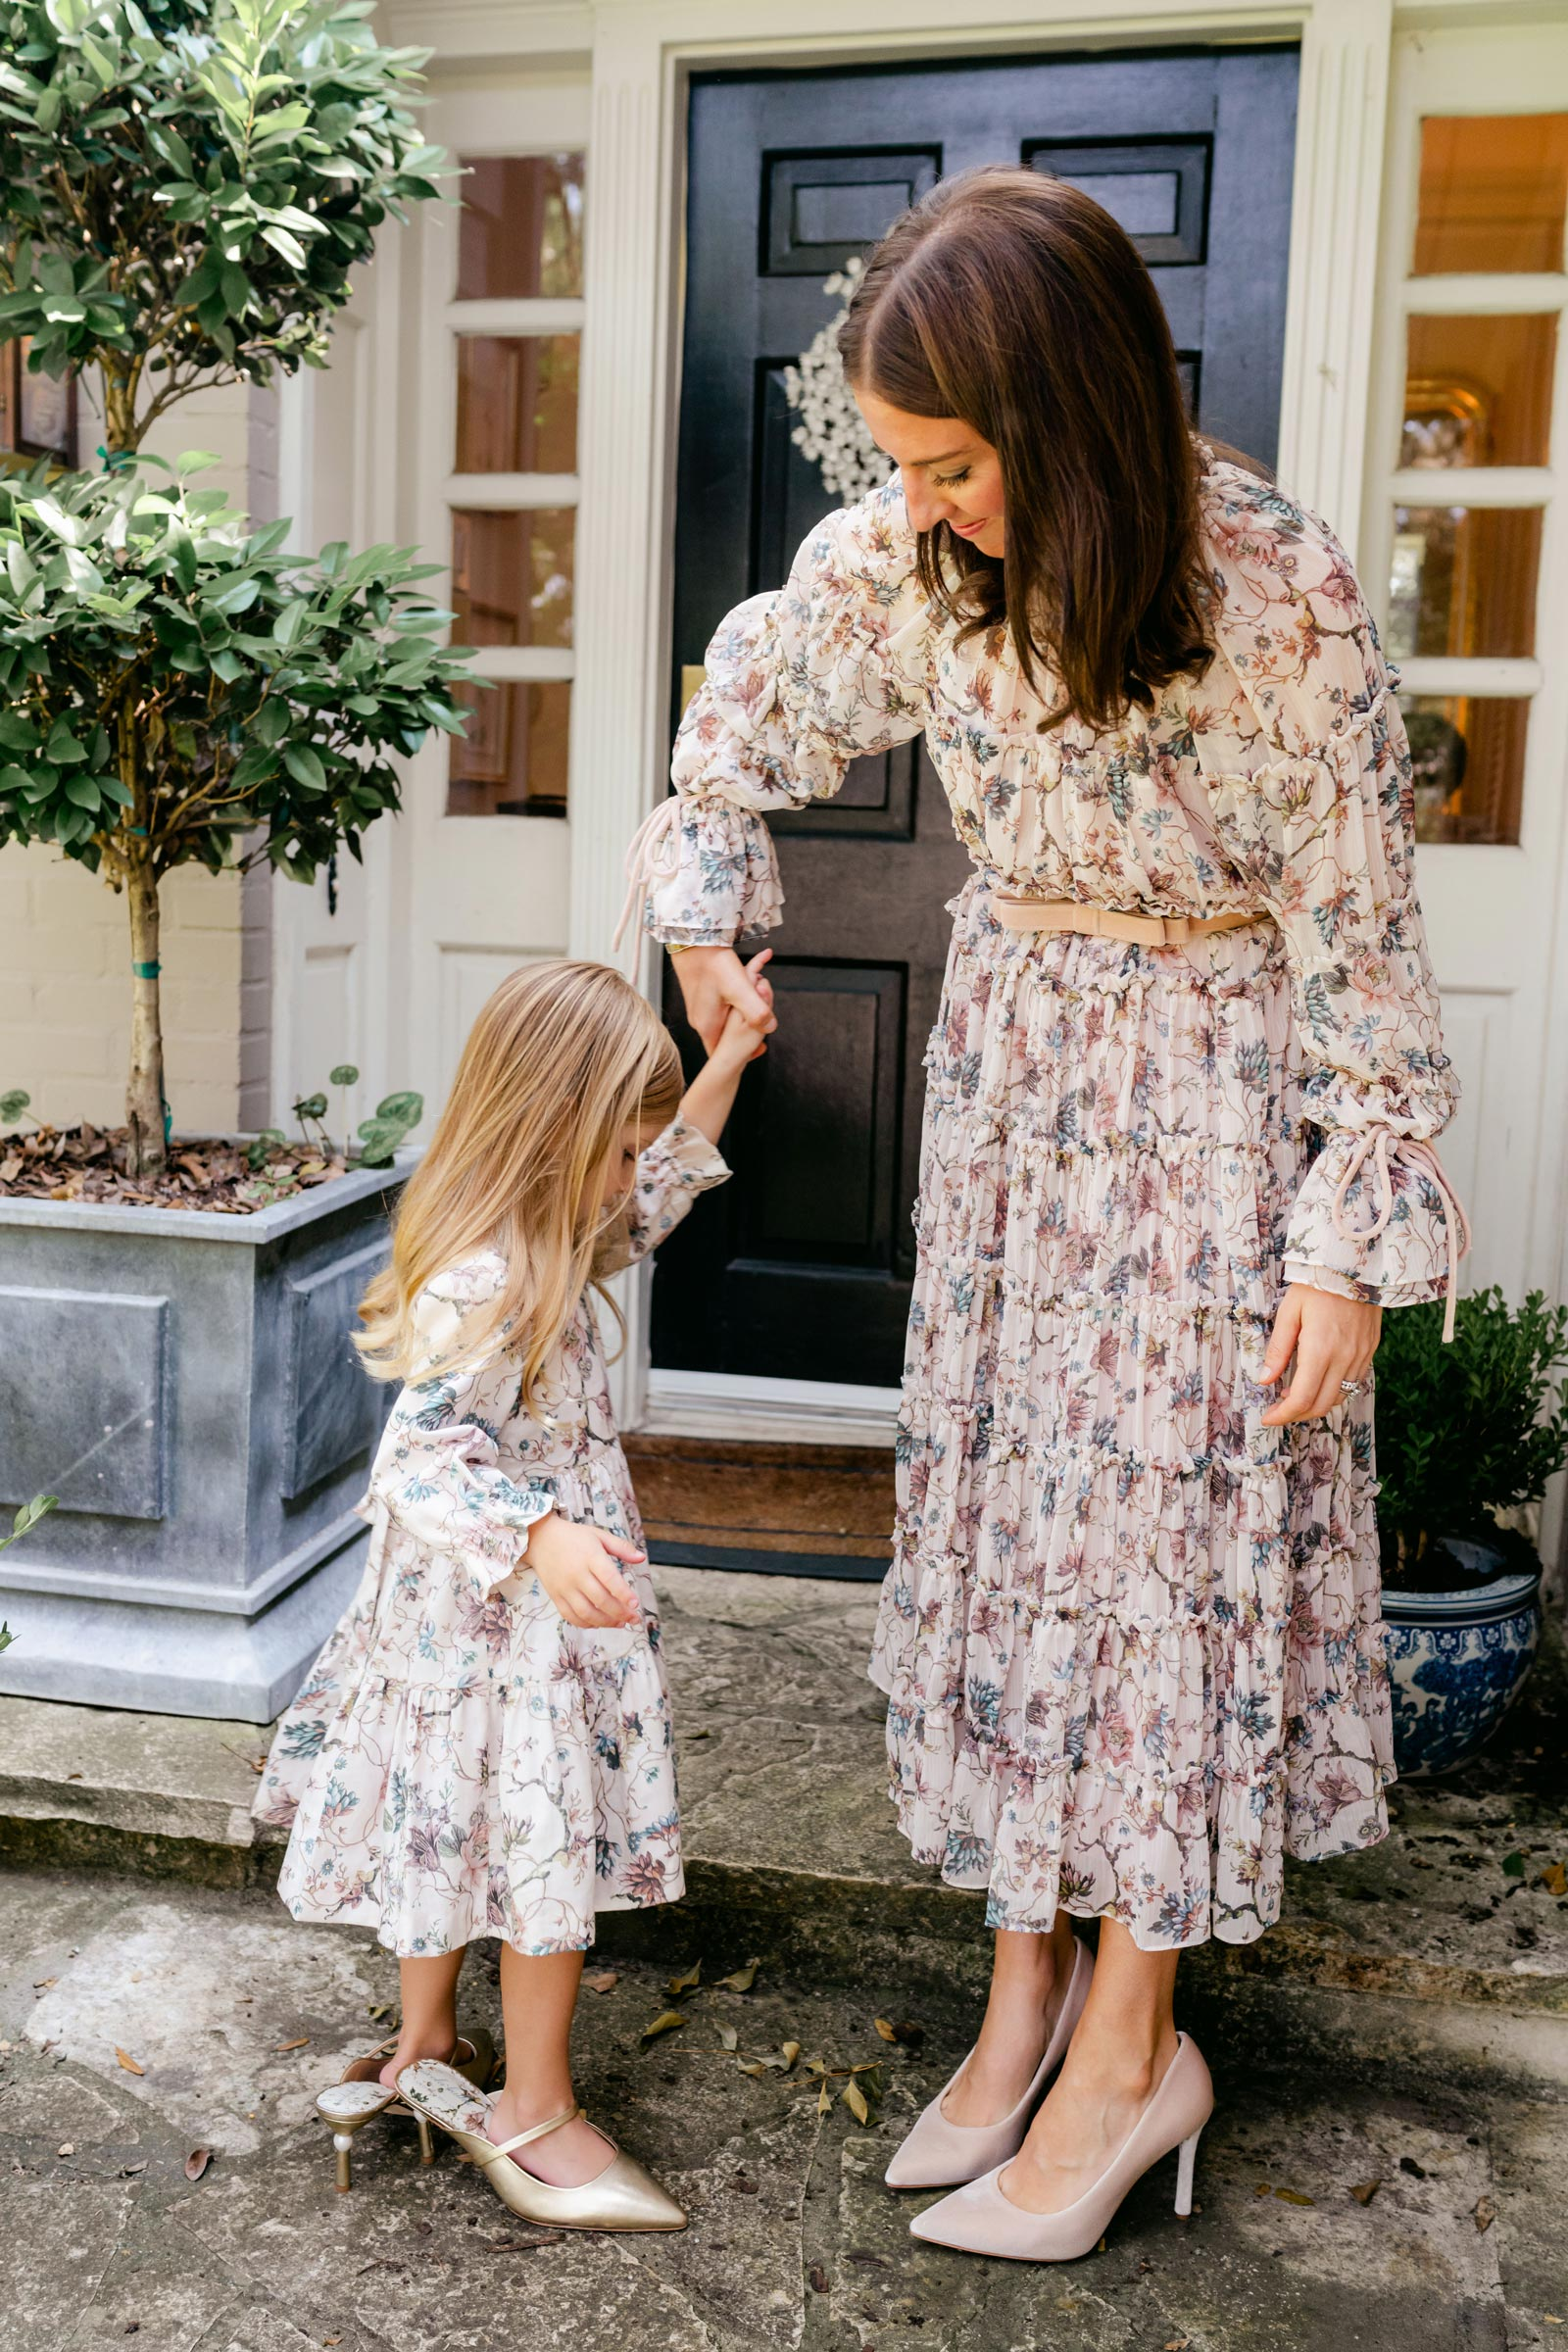 nicola bathie dillards floral dress